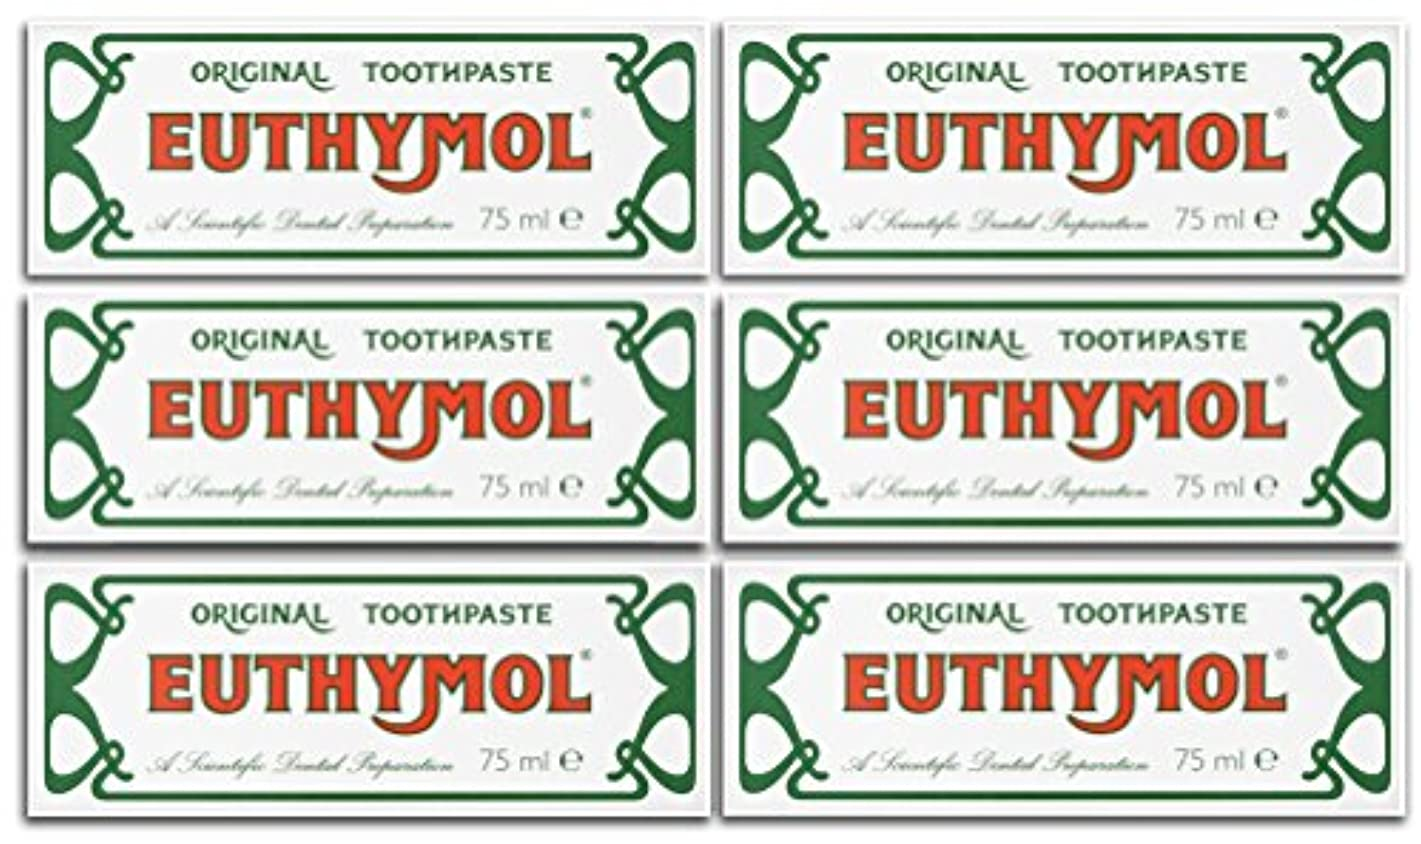 二次植生表示Euthymol Original Toothpaste 75ml (Case Of 6) by Euthymol